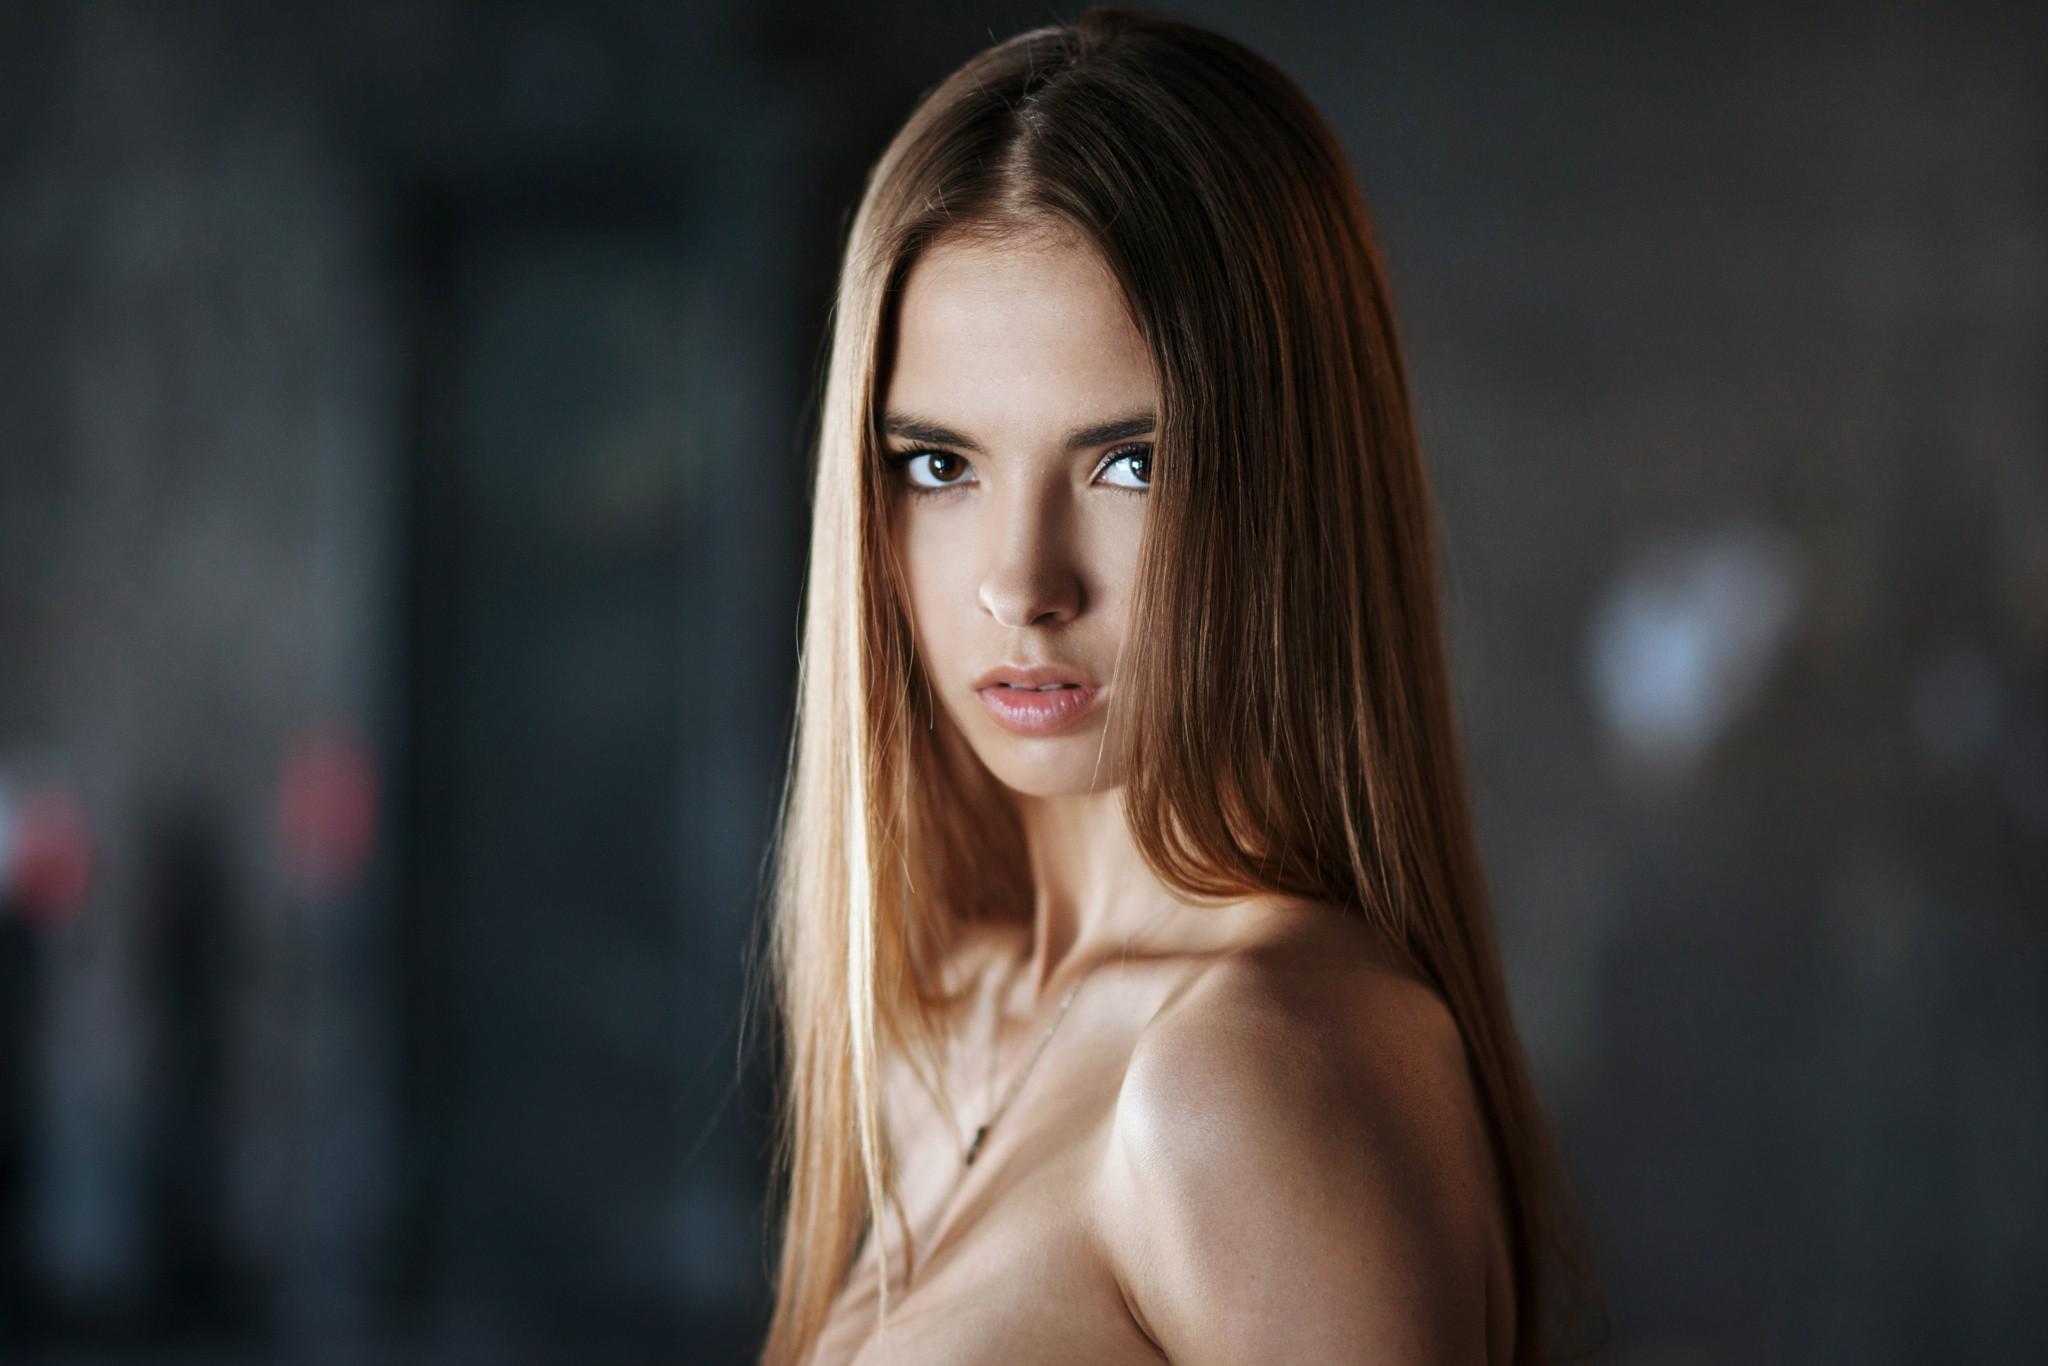 vk ck XVIDEOSCOM  XVIDEOSCOM  Free Porn Videos